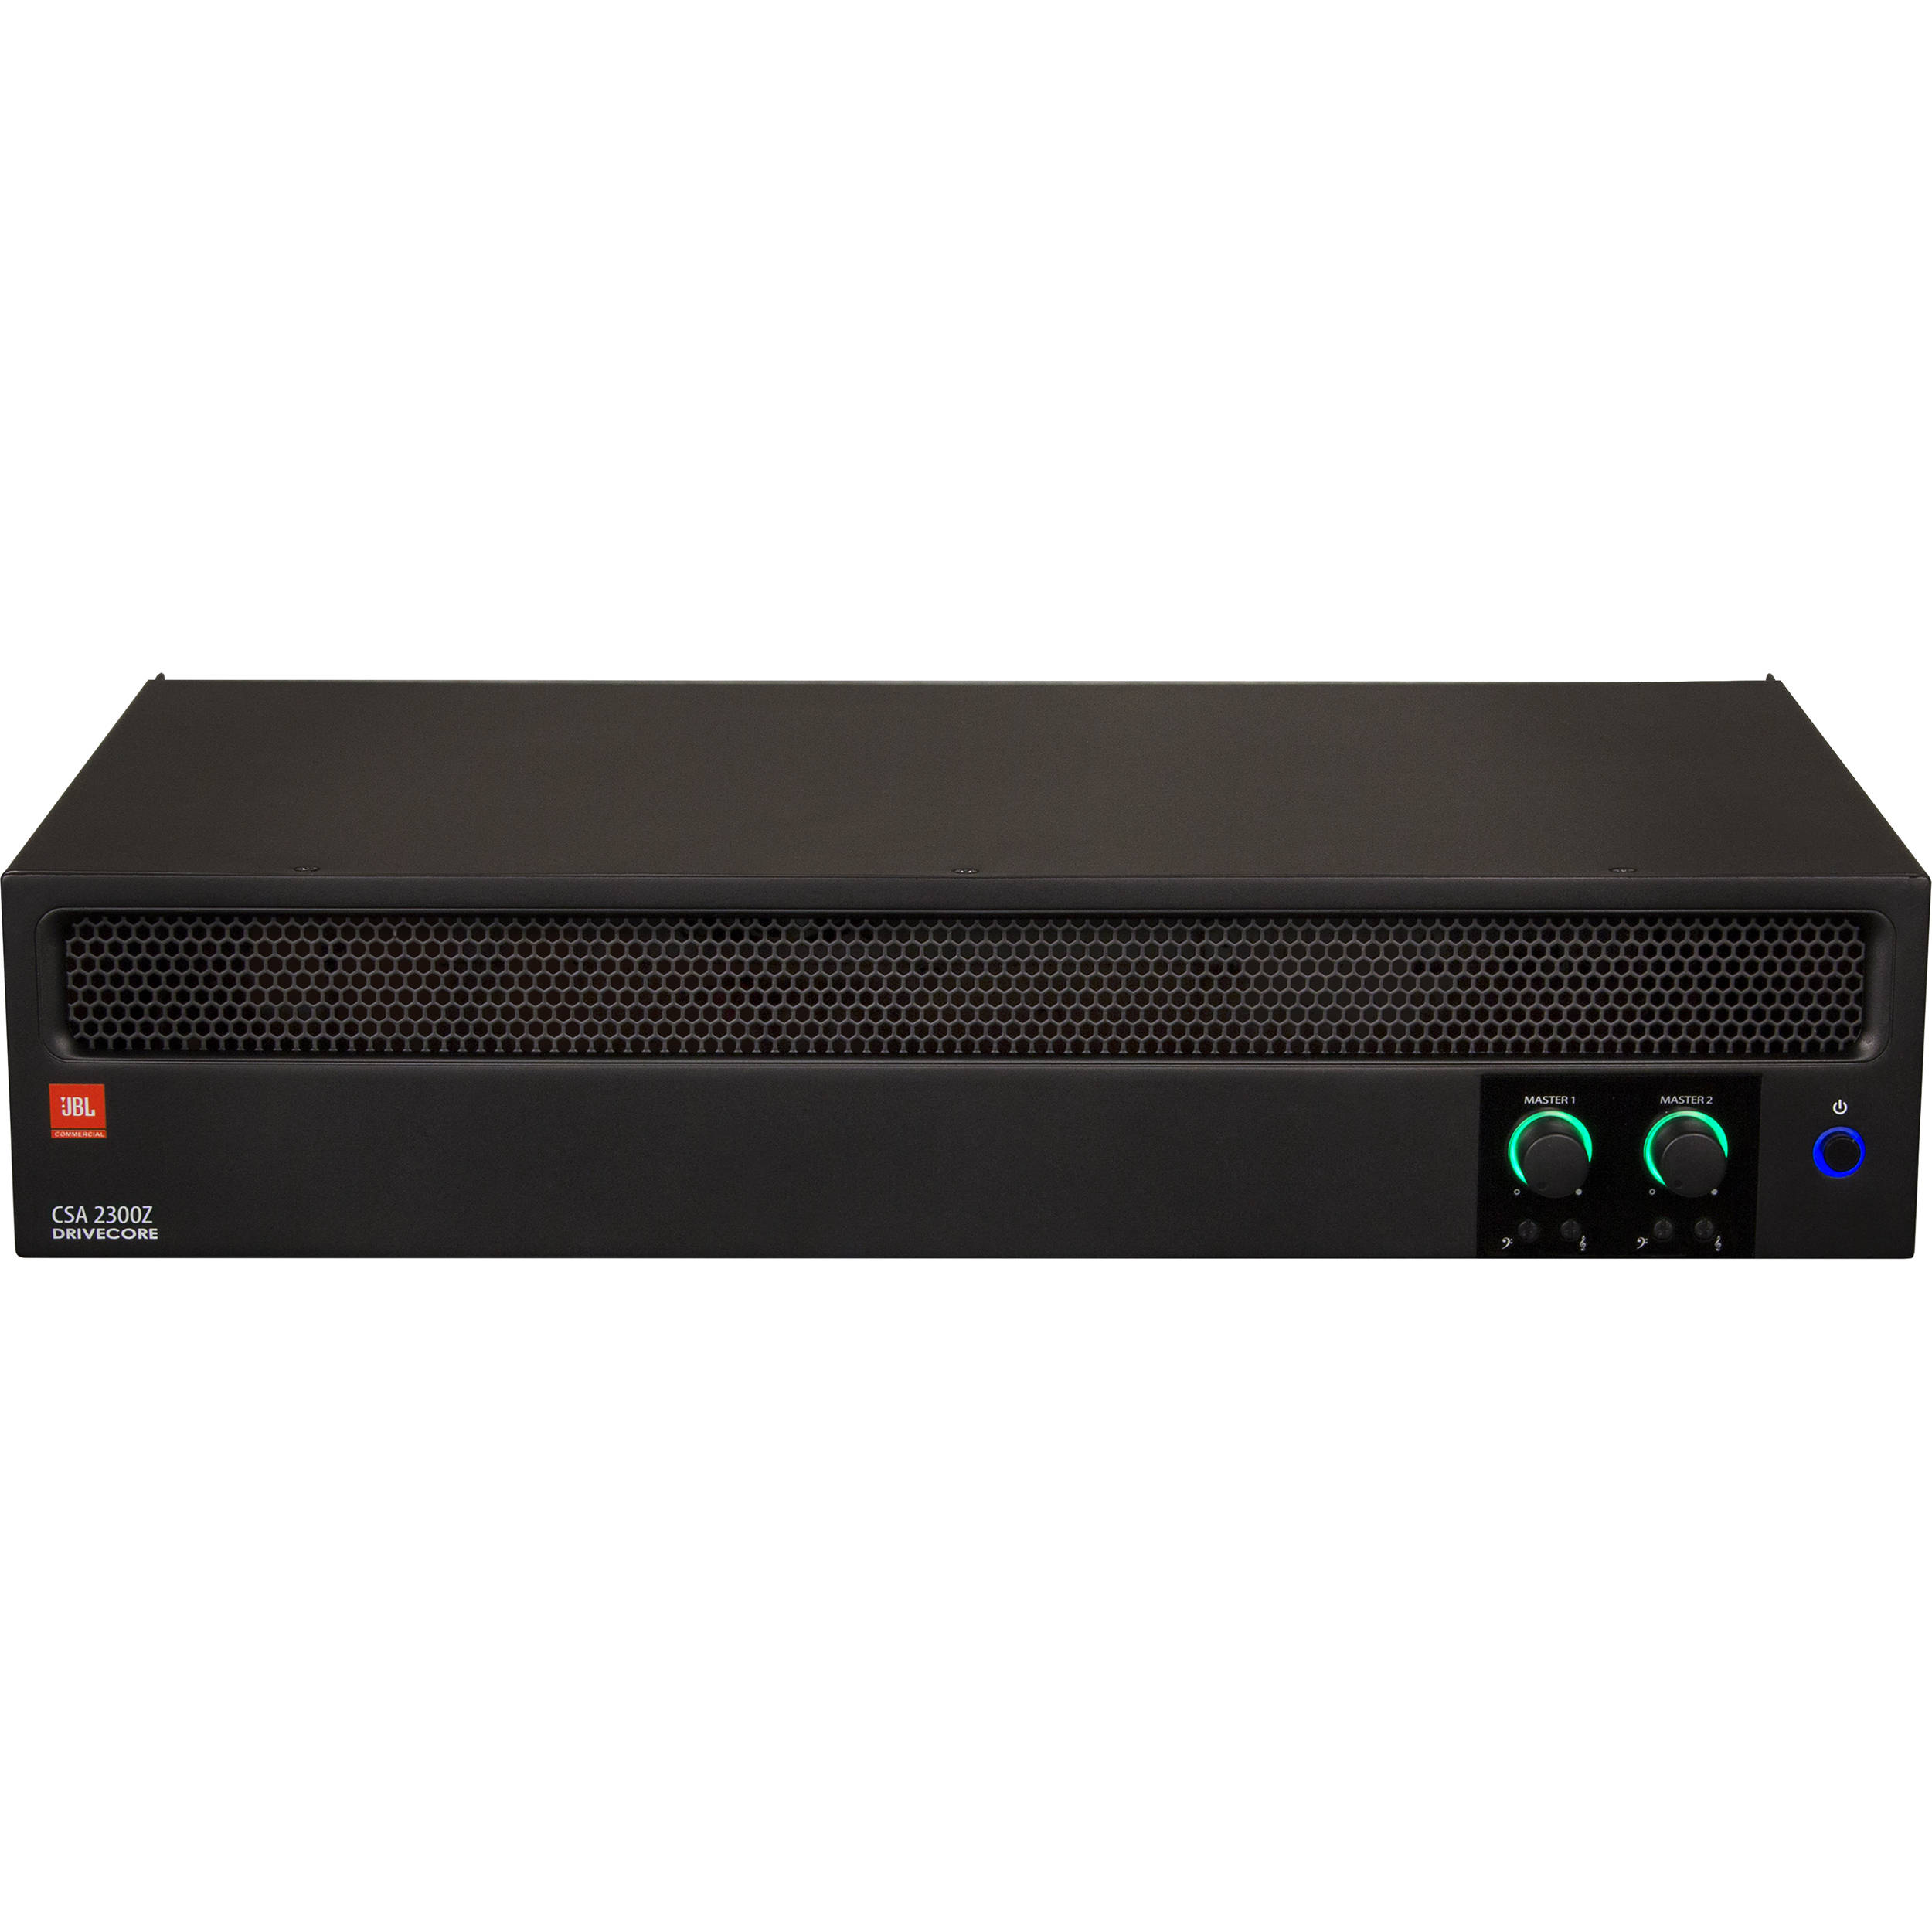 Jbl Csa 2300z Dual Channel 300w Amplifier Csa2300z Bh Photo High Power Schematic Diagram